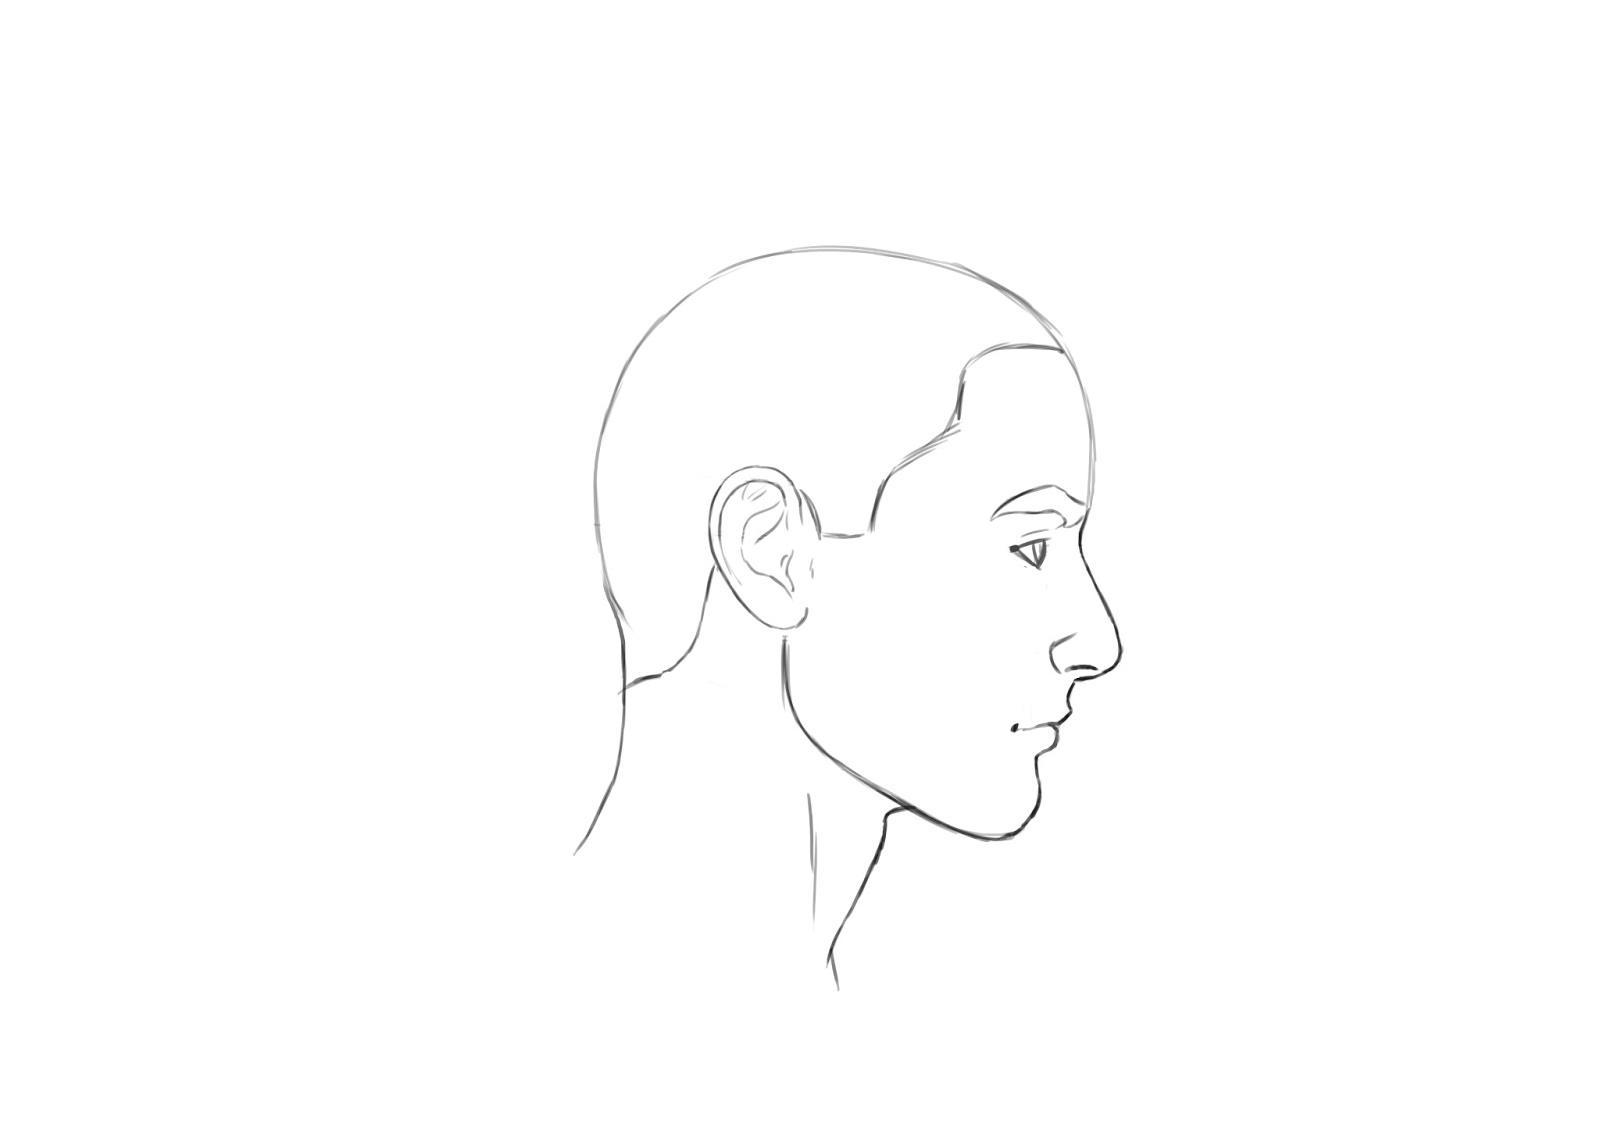 Drawn profile hairline : how Panos around Illustrator